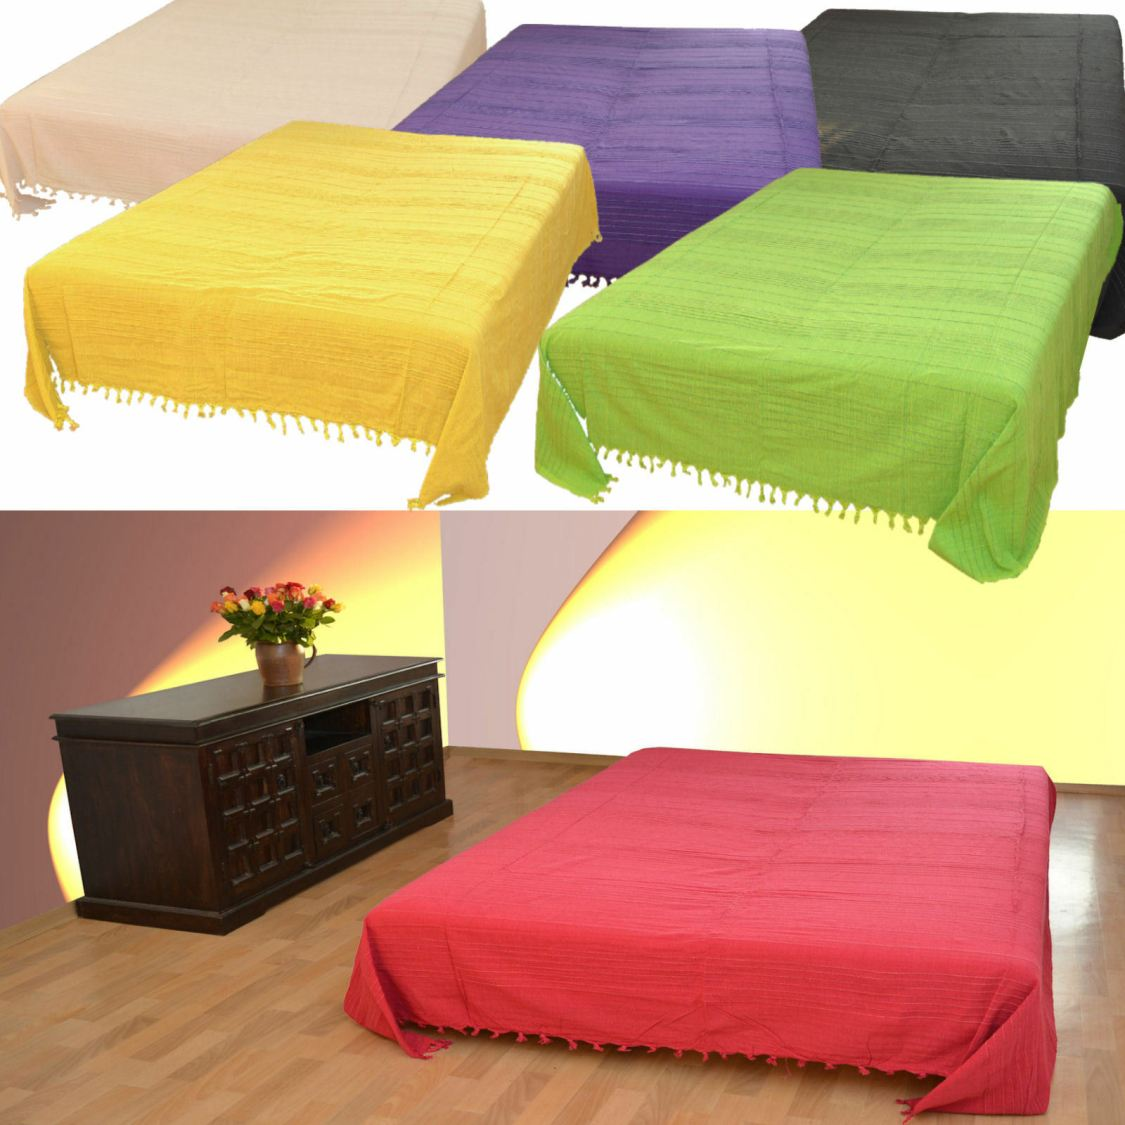 Tagesdecke XXL Sofaüberwurf Bettüberwurf Wohndecke Nepal Plaid Baumwolle Decke *